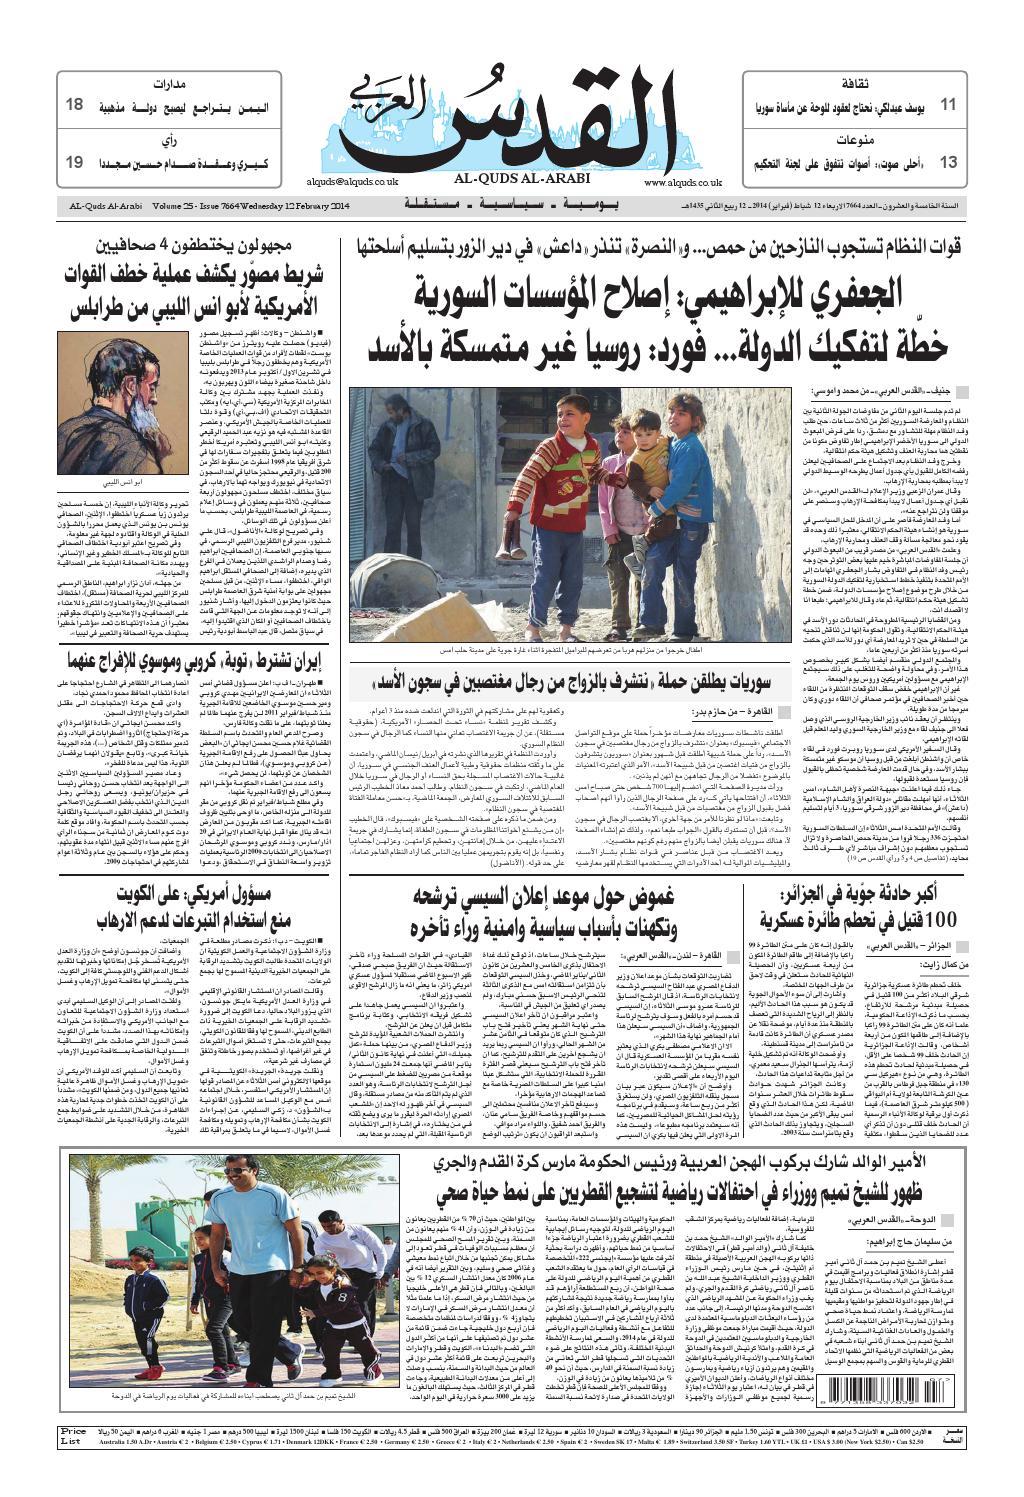 f919819a7 صحيفة القدس العربي , الأربعاء 12.02.2014 by مركز الحدث - issuu